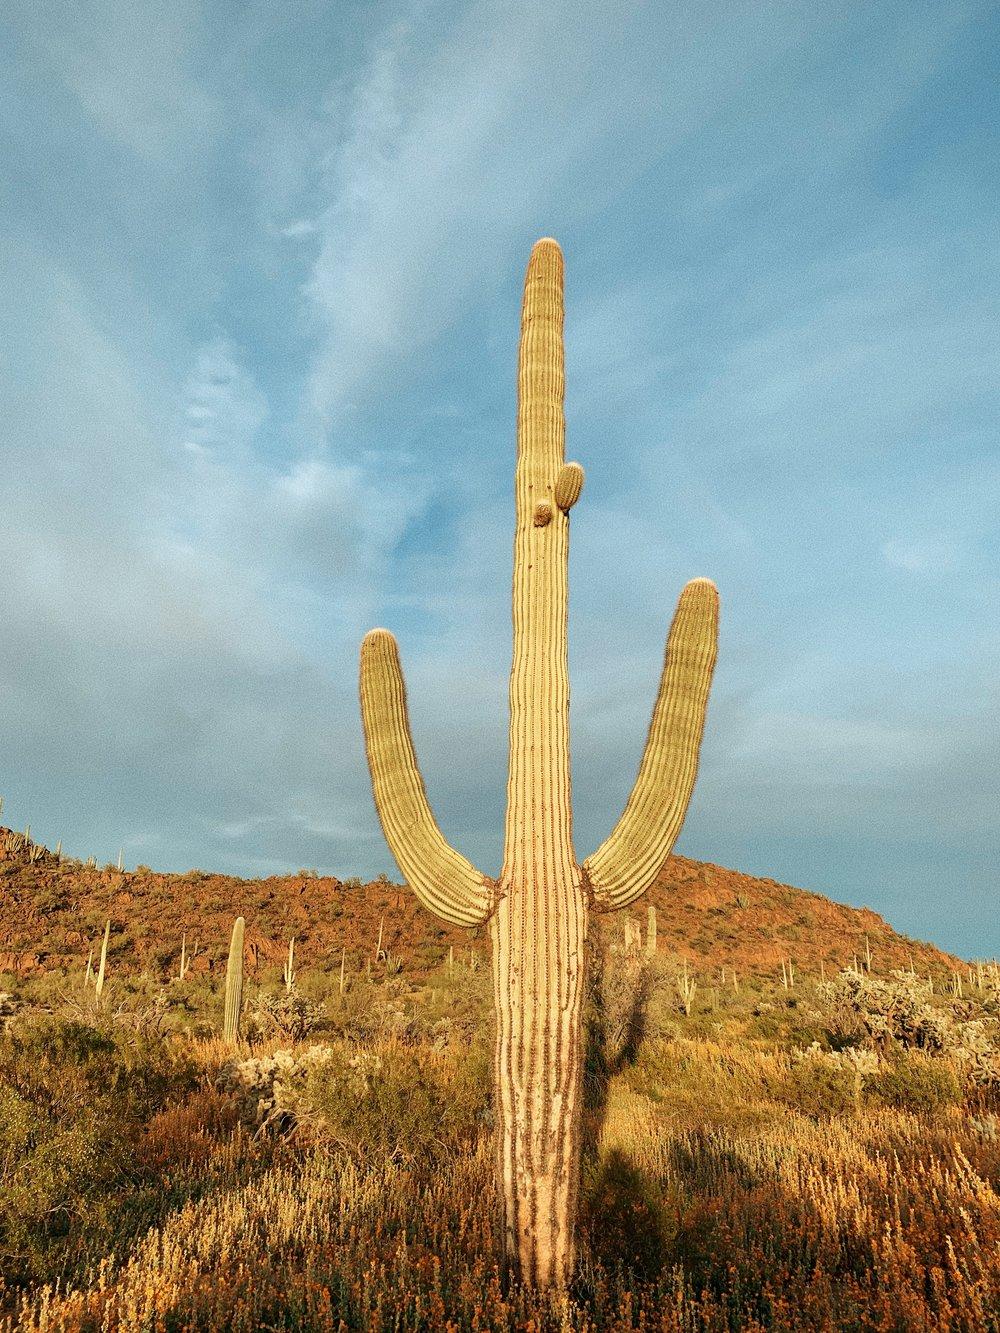 saguaro cactus, tohono o'odam nation, 2019